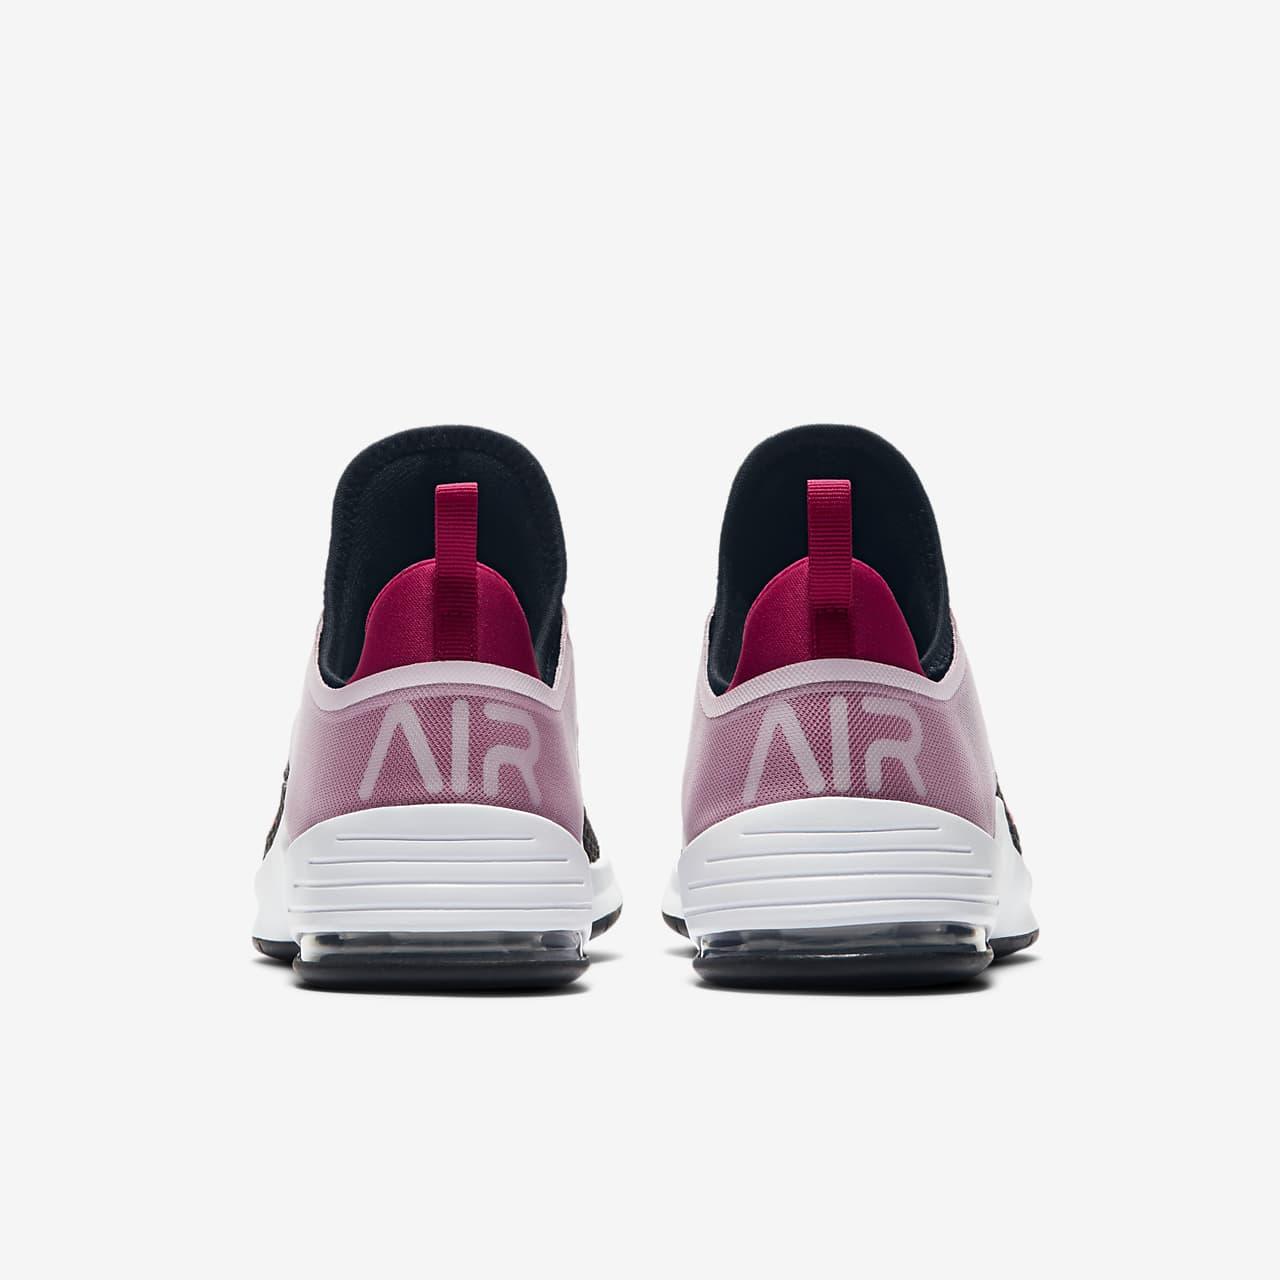 nike air max bella tr 2 women's training shoes